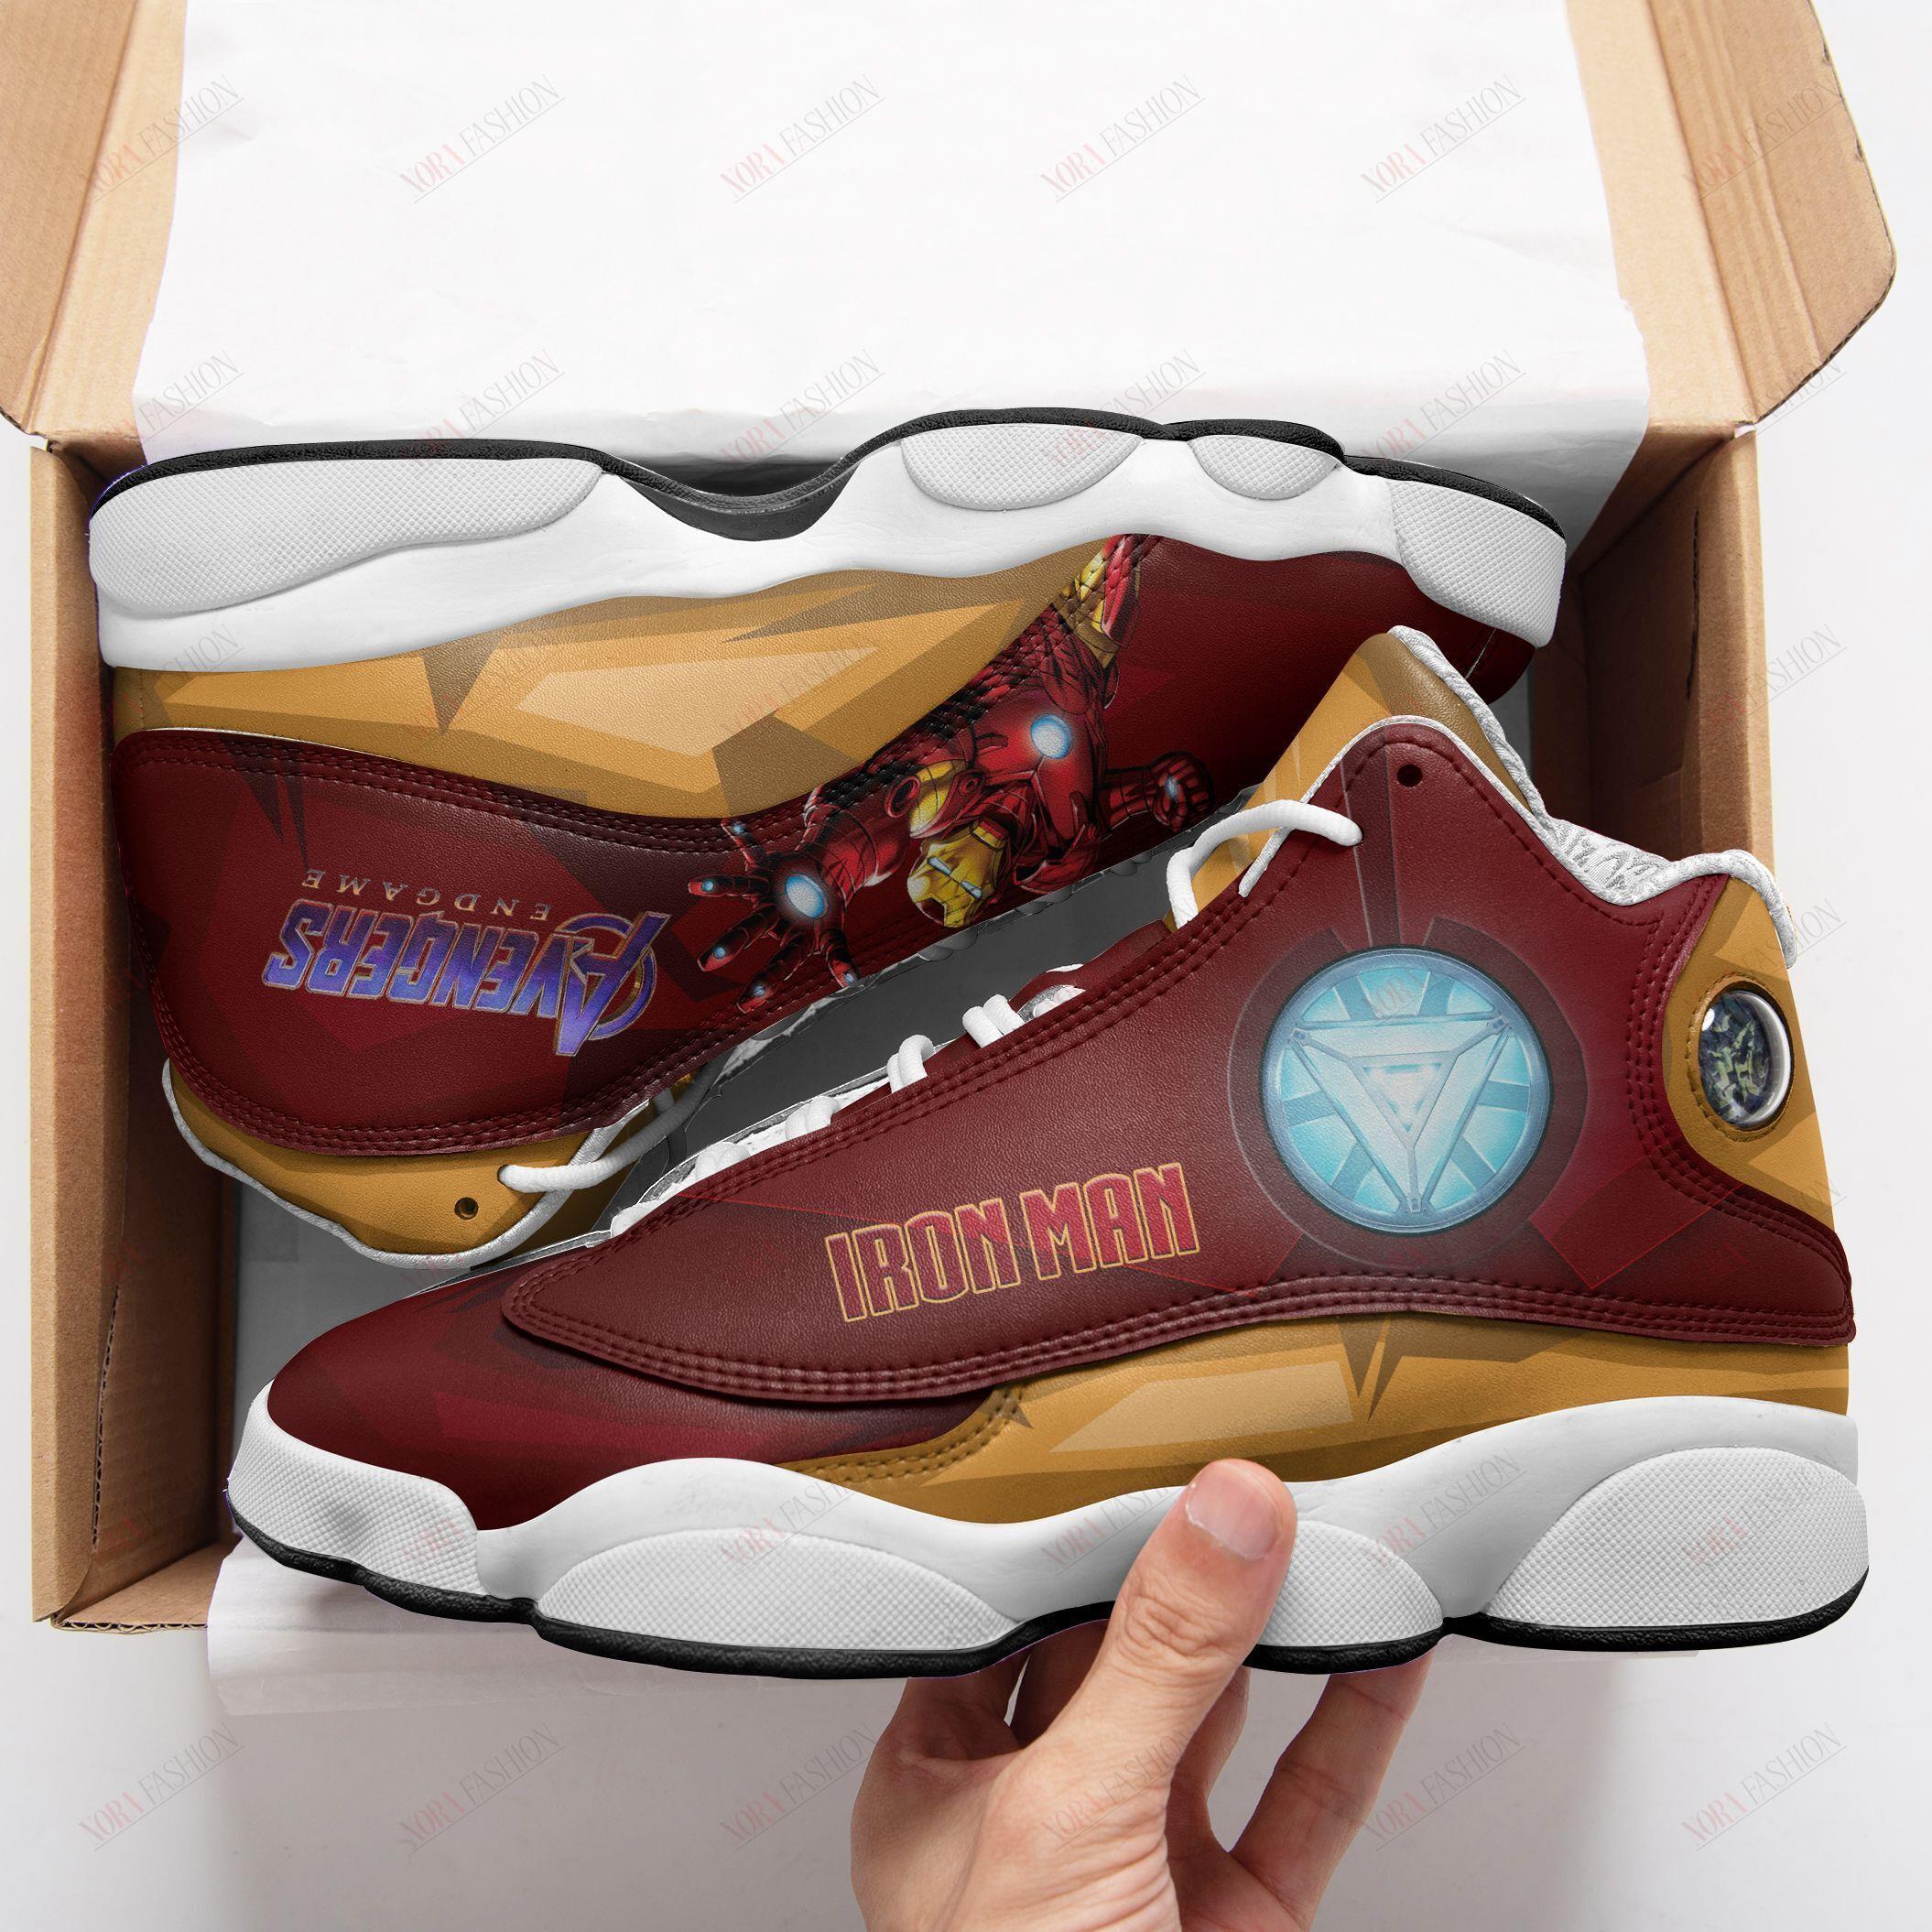 Iron Man Air Jordan 13 Sneakers Sport Shoes